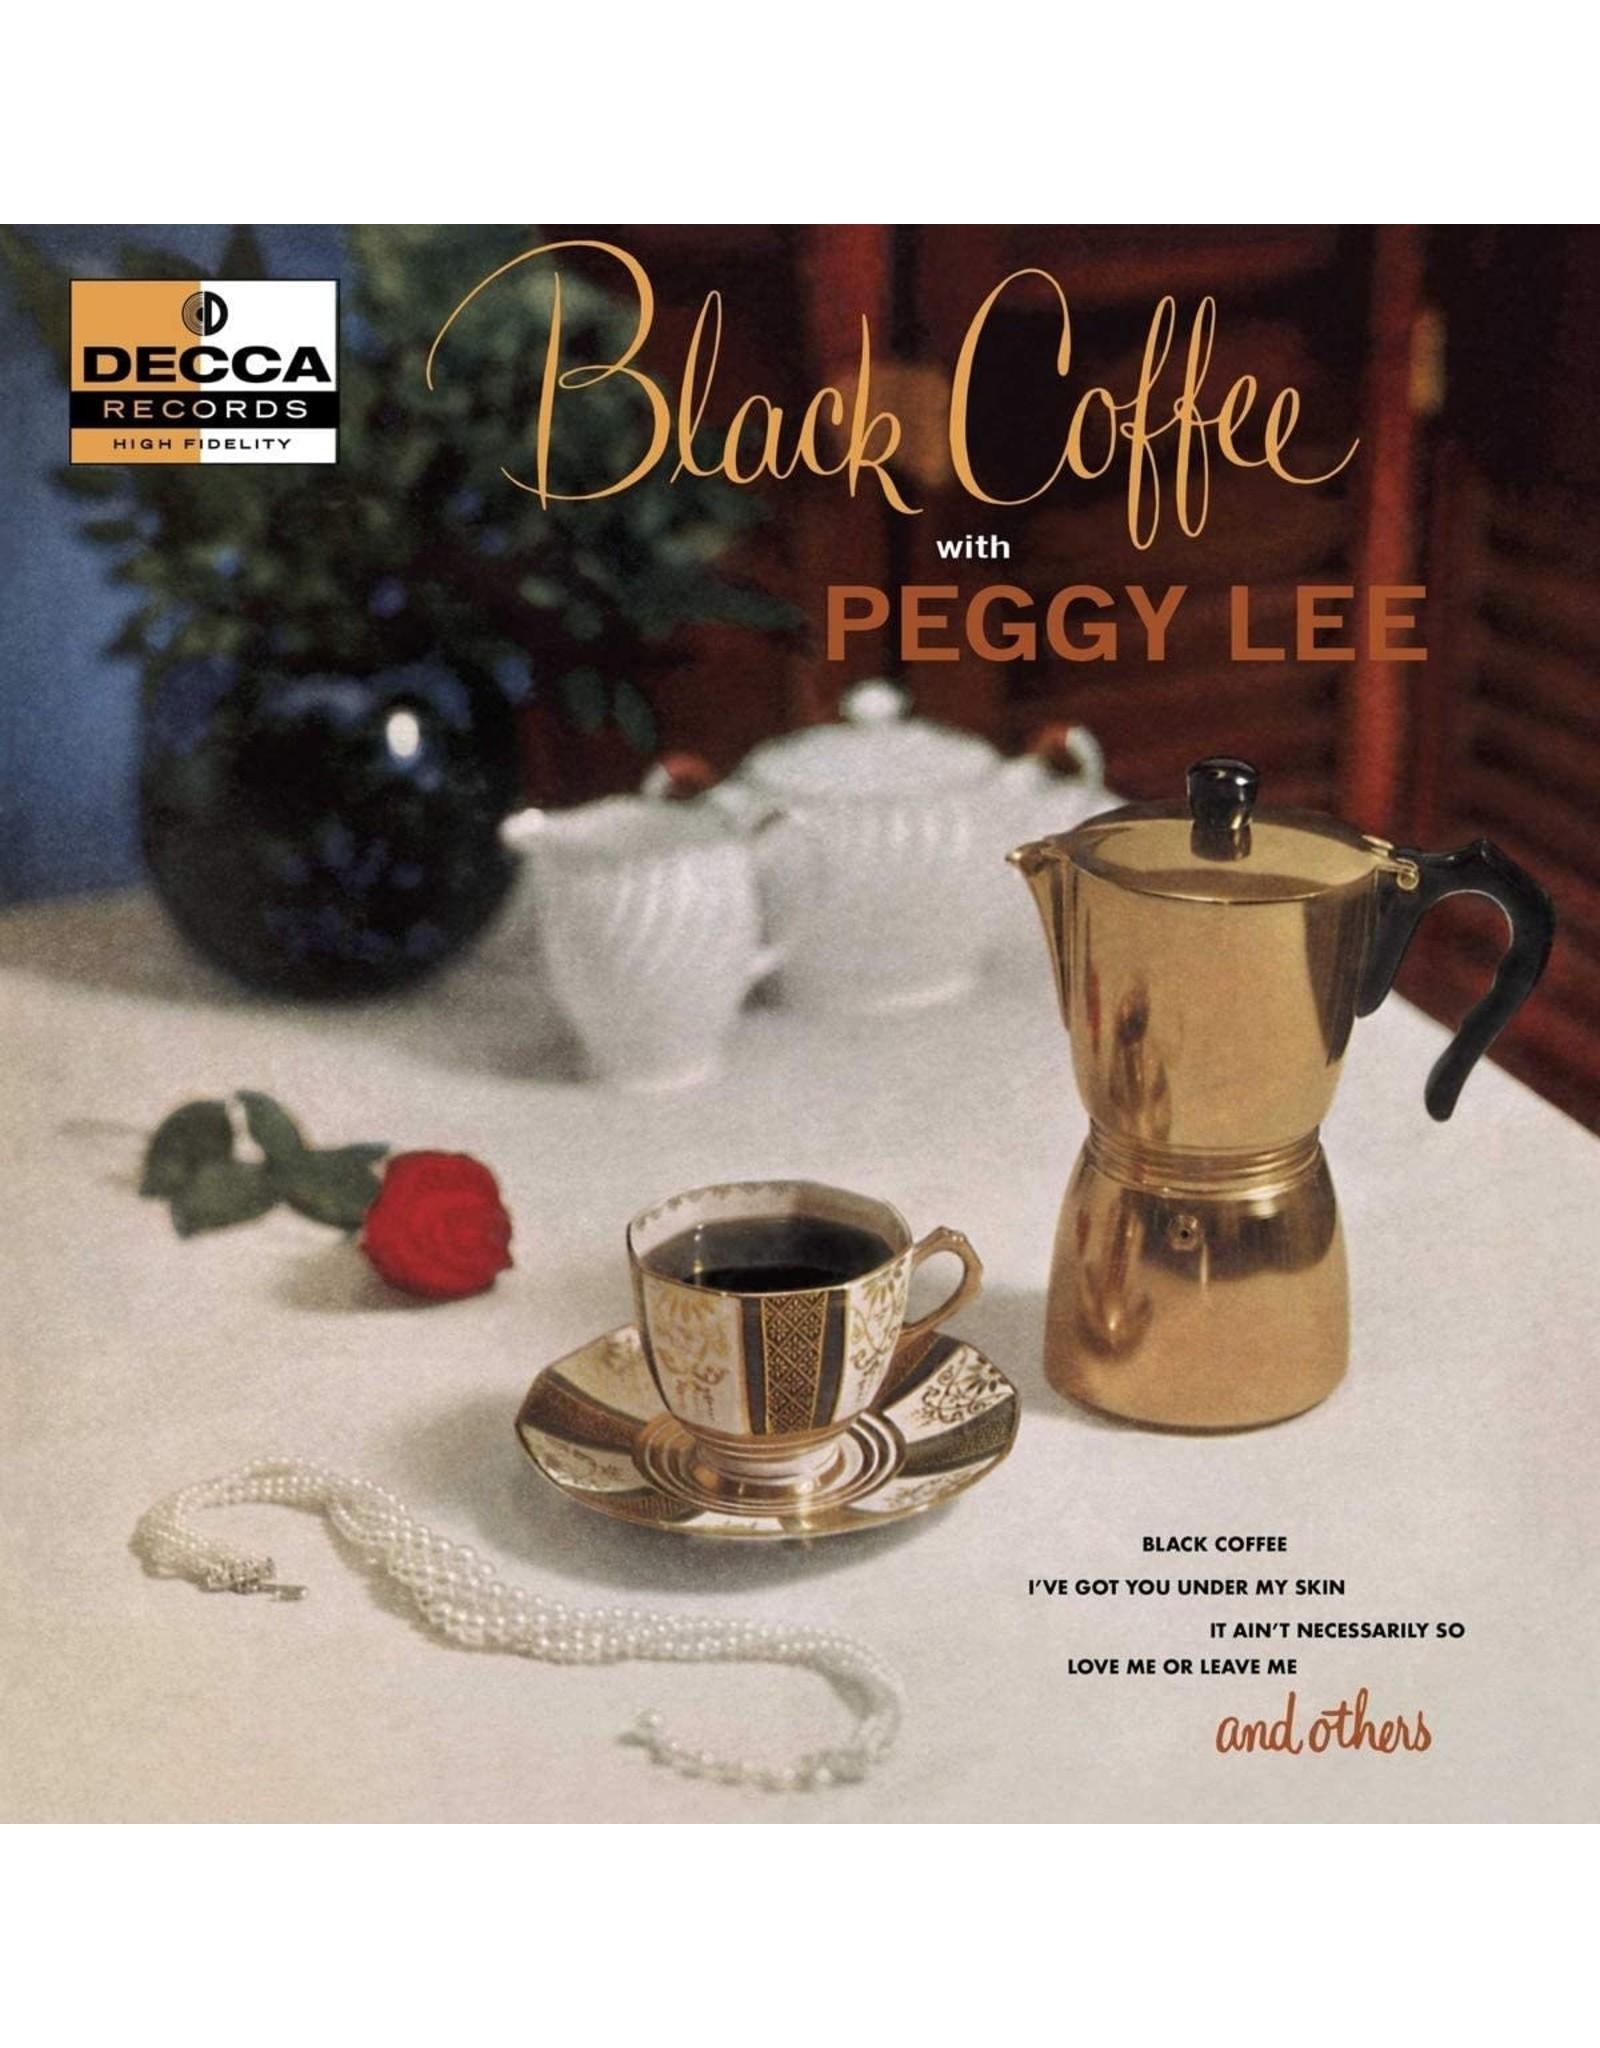 Lee, Peggy - Black Coffee (Acoustic Sound Series) LP